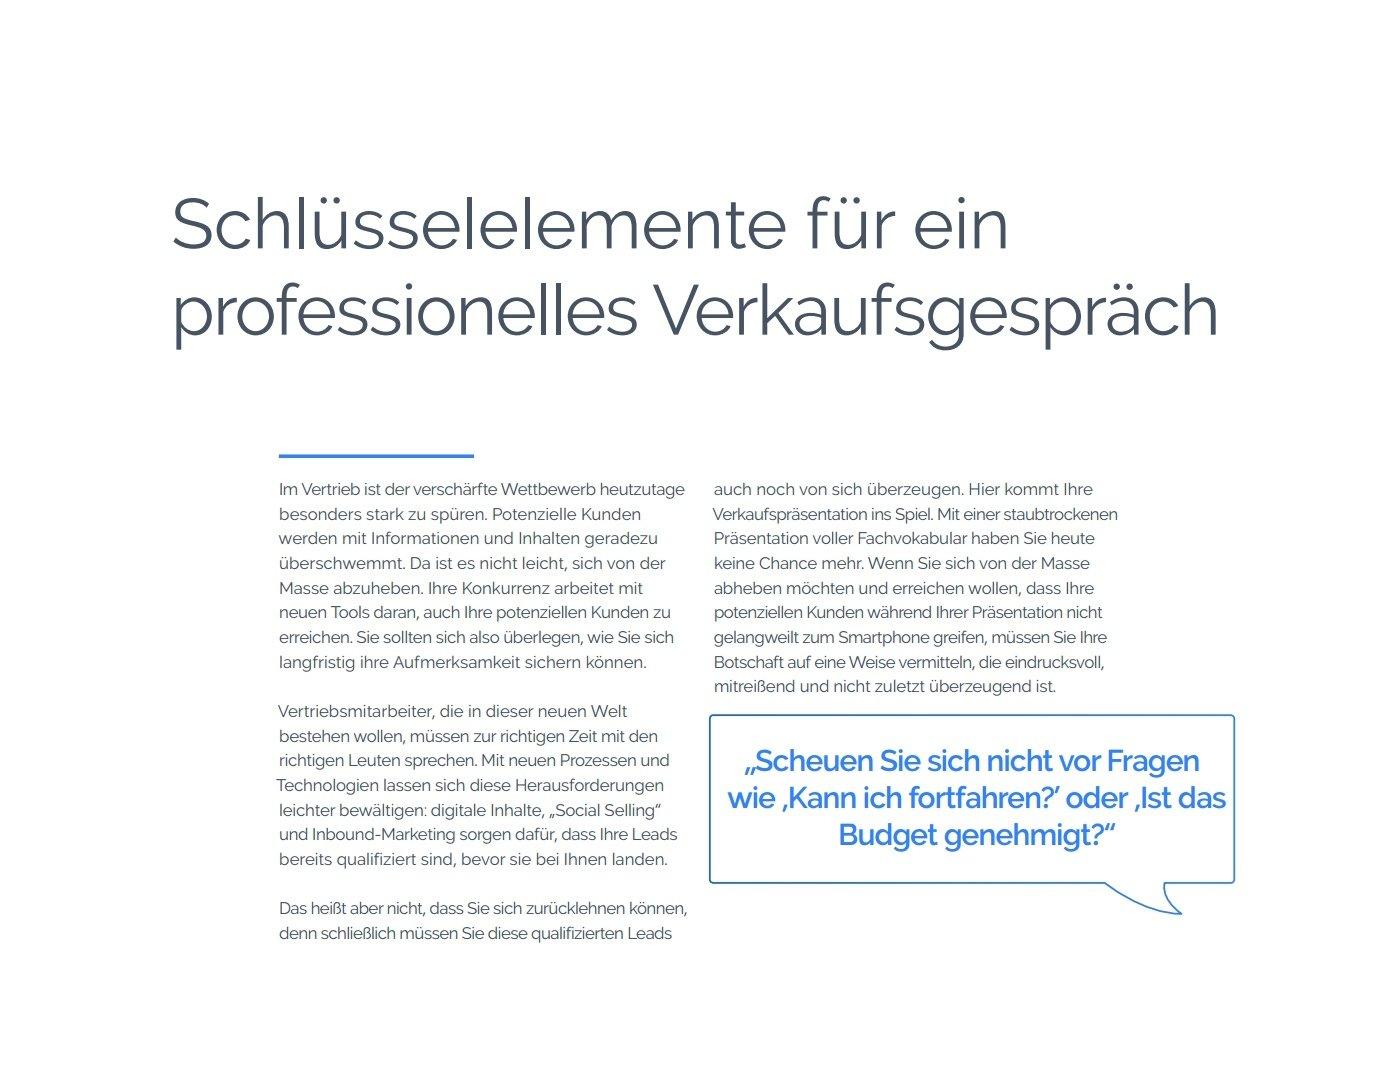 HubSpot & Prezi – Effektive Verkaufspräsentationen – Vorschaubild 2